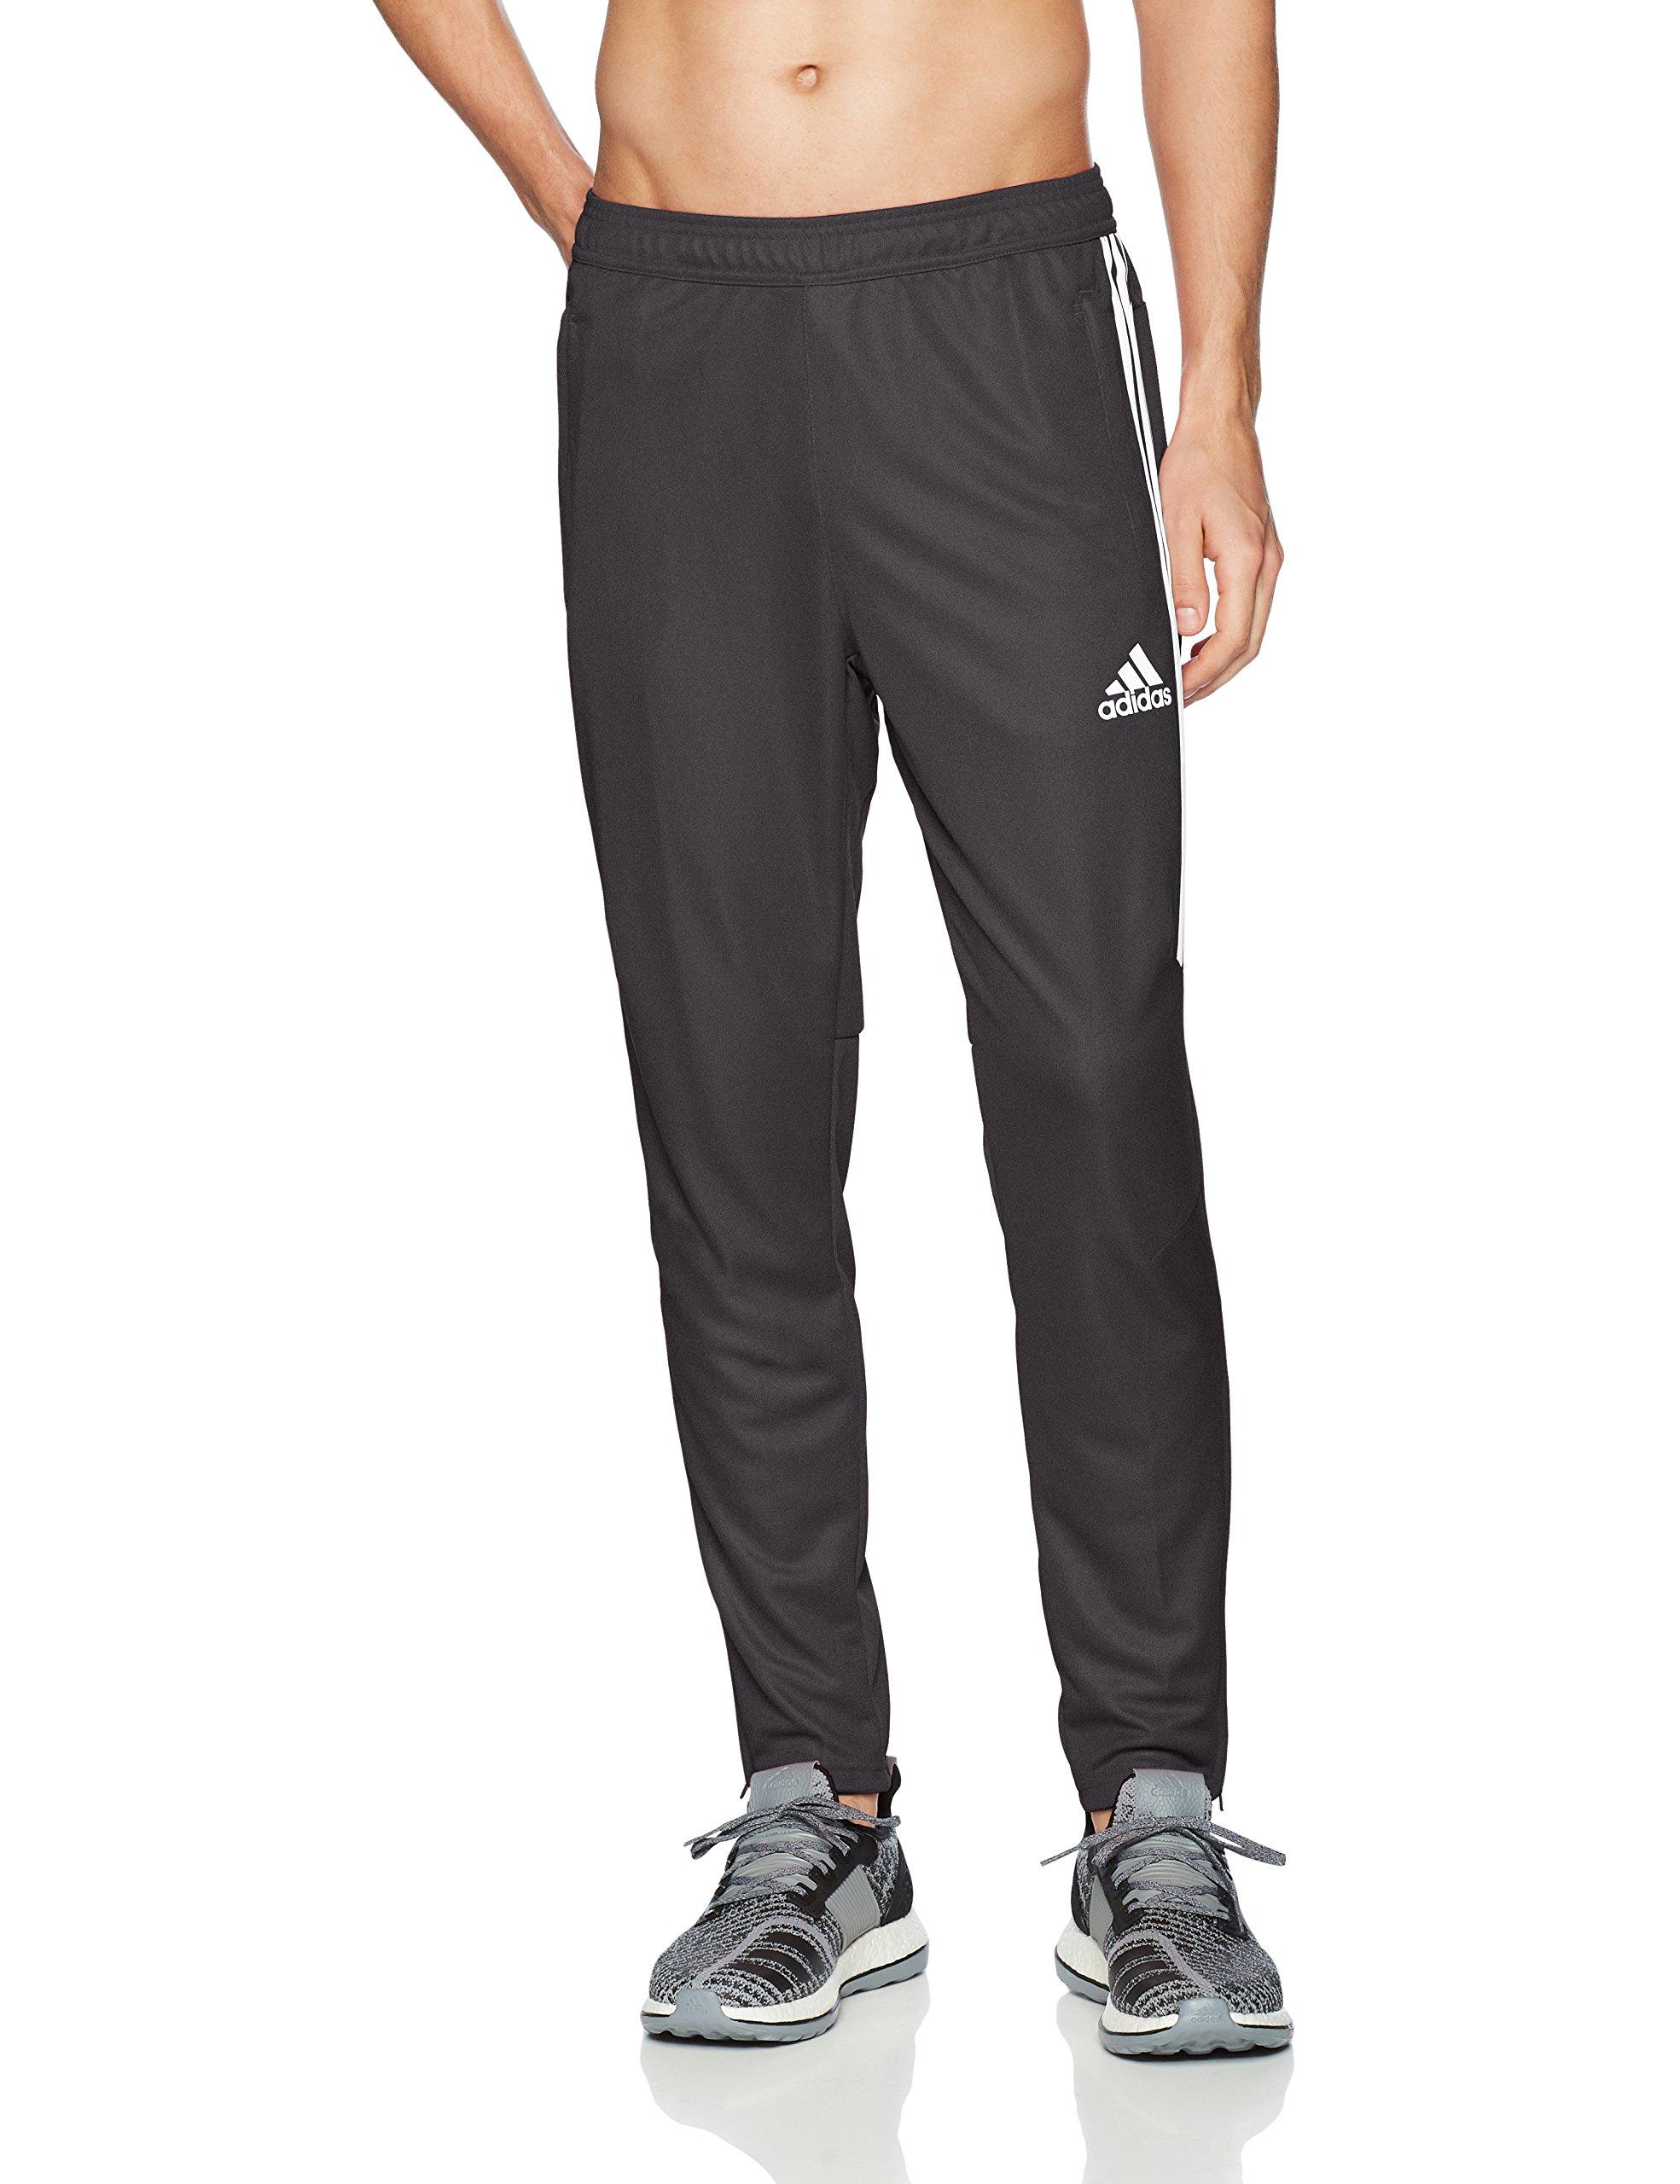 adidas Men's Soccer Tiro 17 Pants, Medium, Black/White/White by adidas